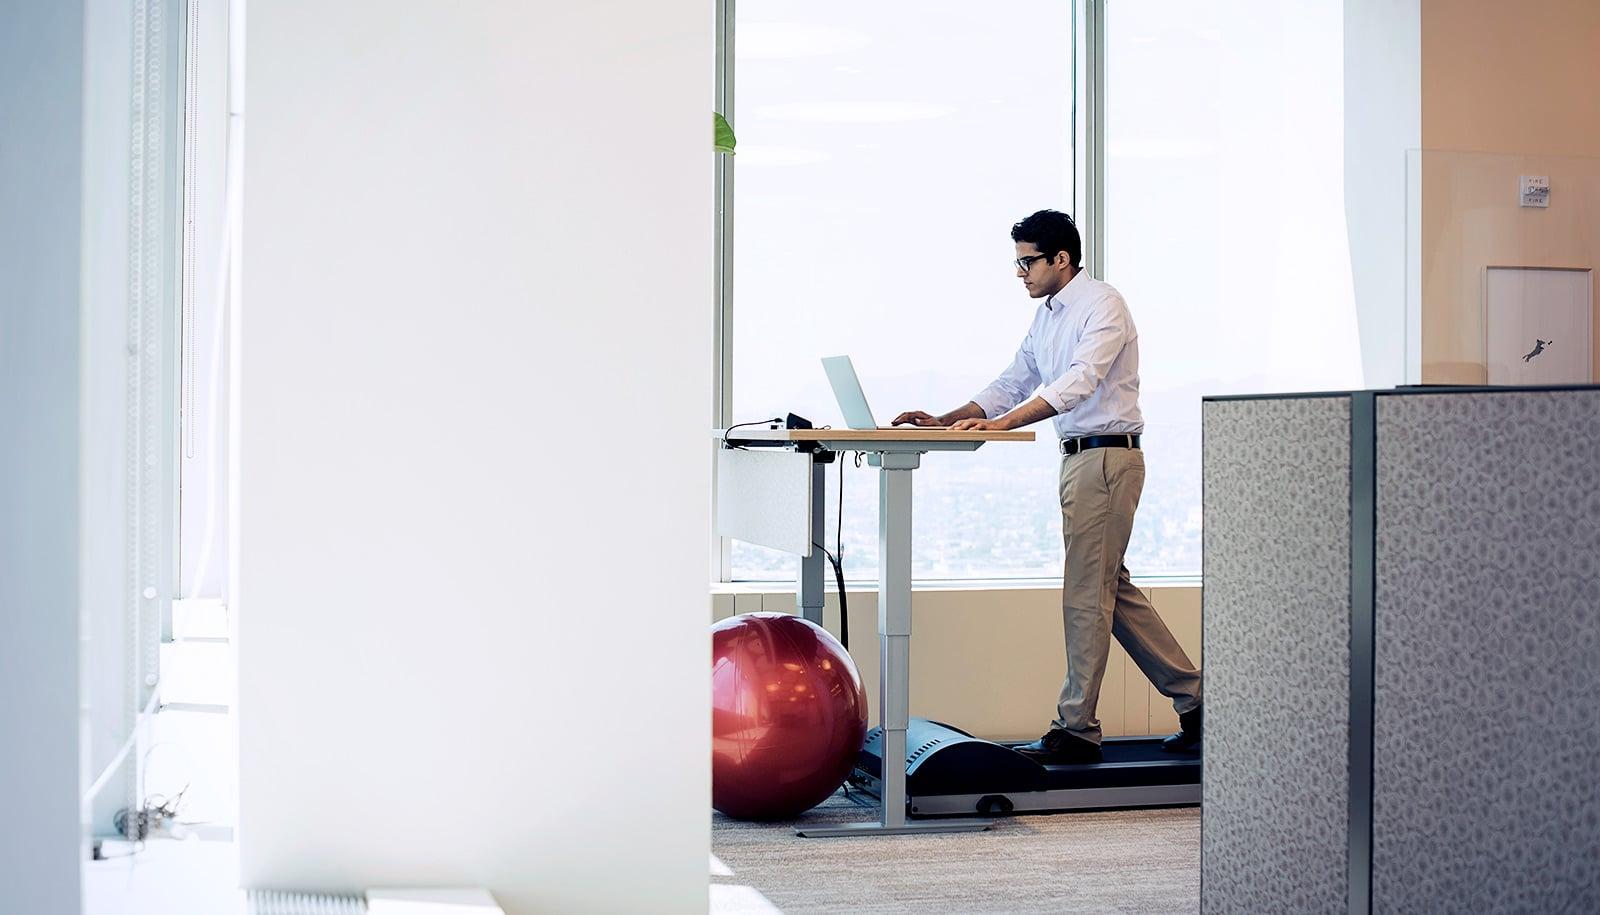 Treadmill desks can hamstring your memory